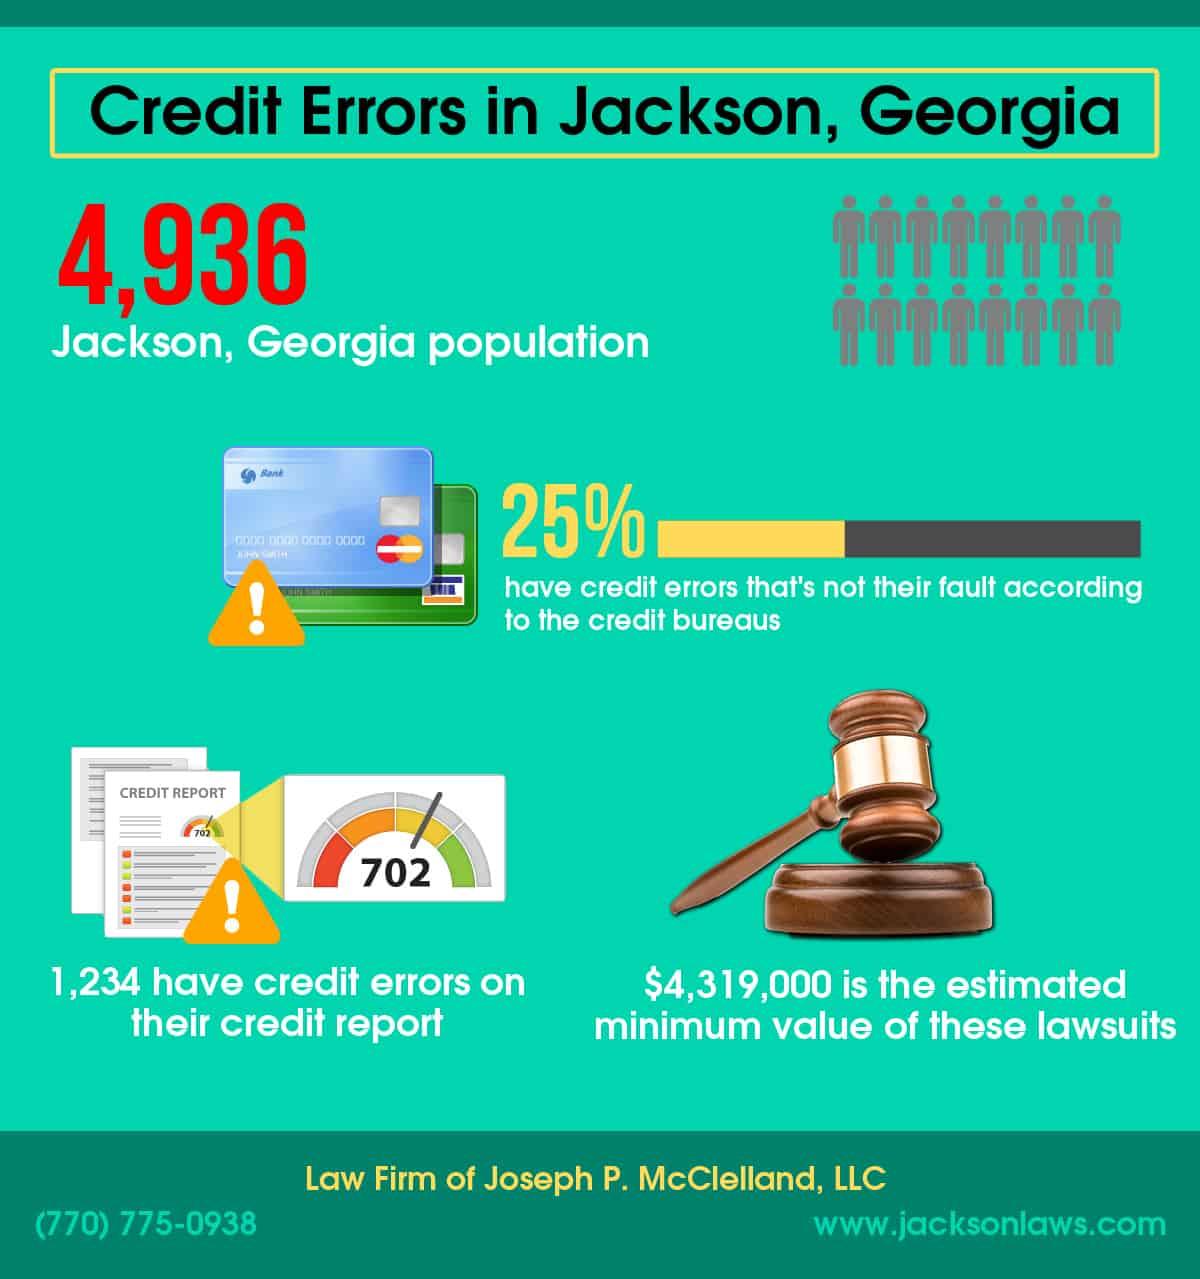 Jackson, GA Credit Errors